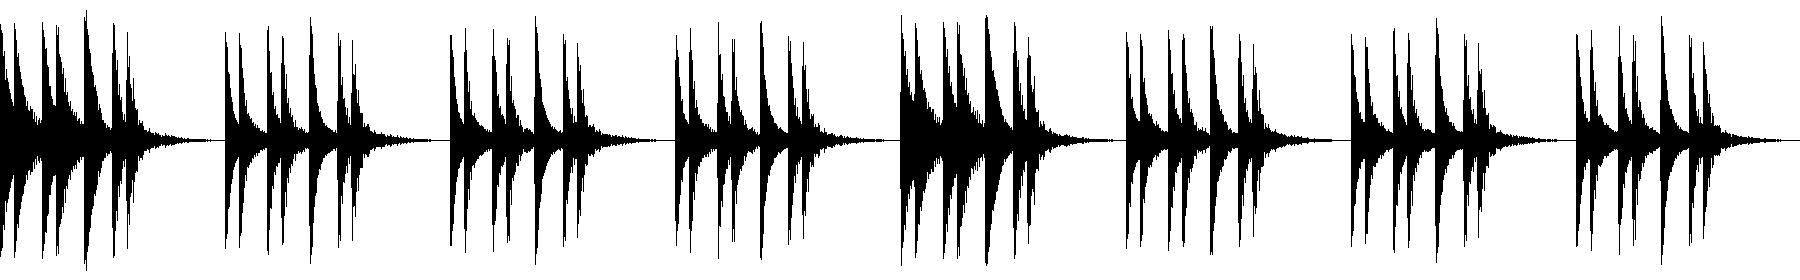 zttc synth loop 06 a 126 bpm